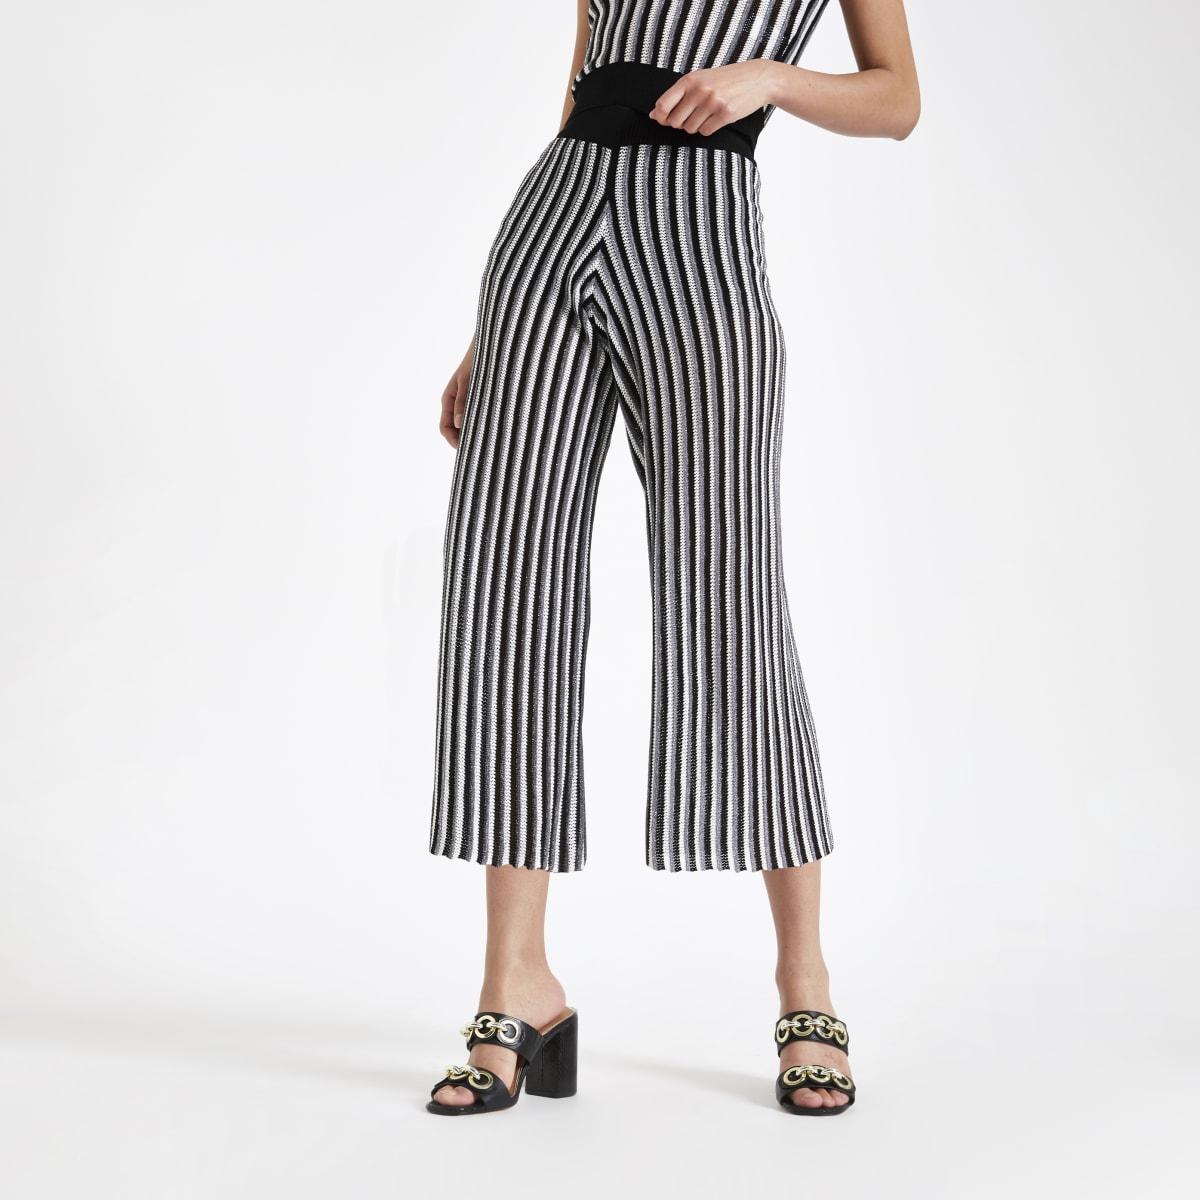 Black stripe knitted pants